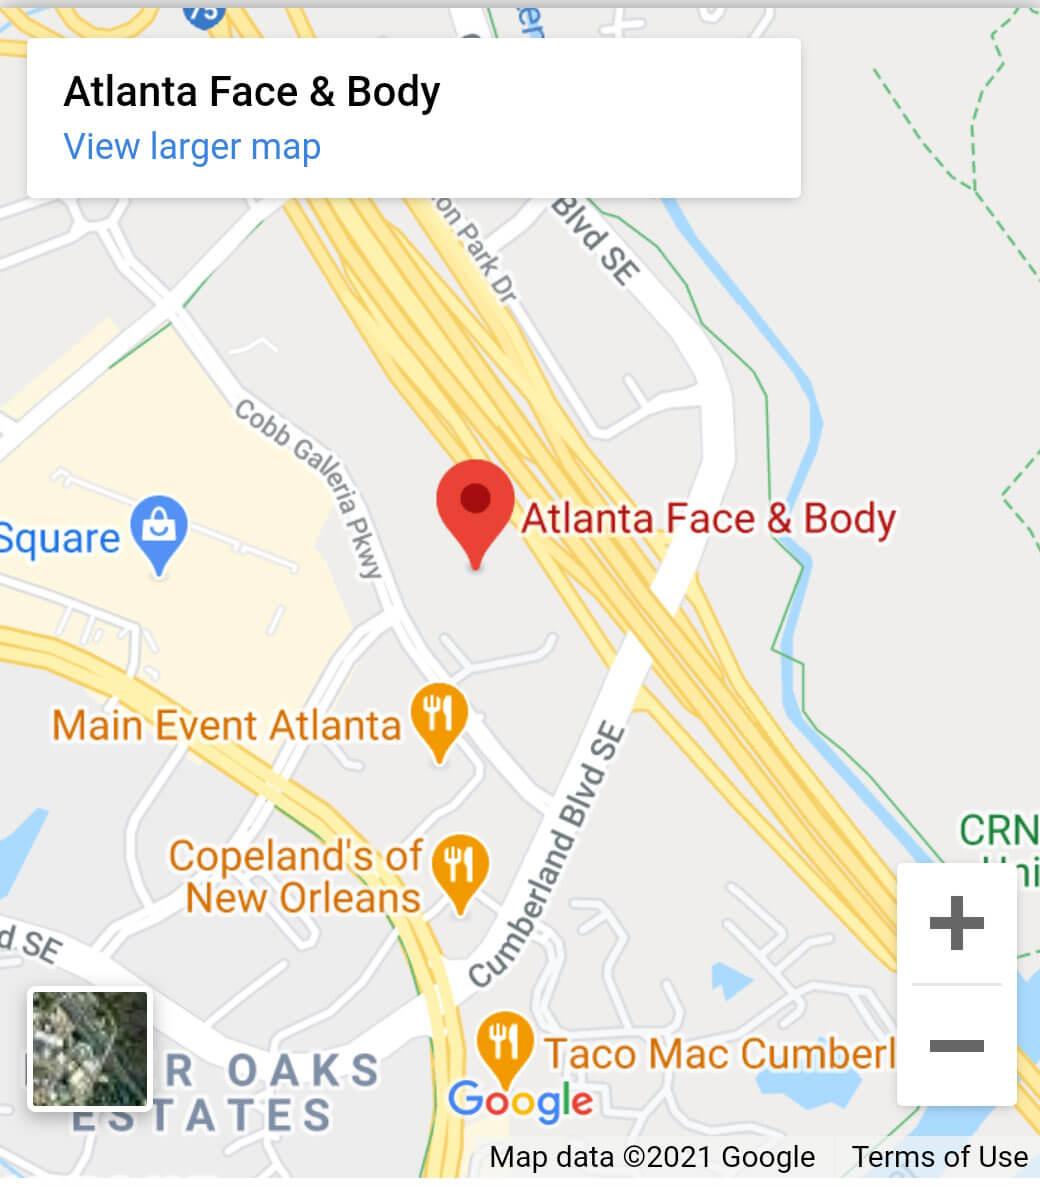 Atlanta Face & Body Map